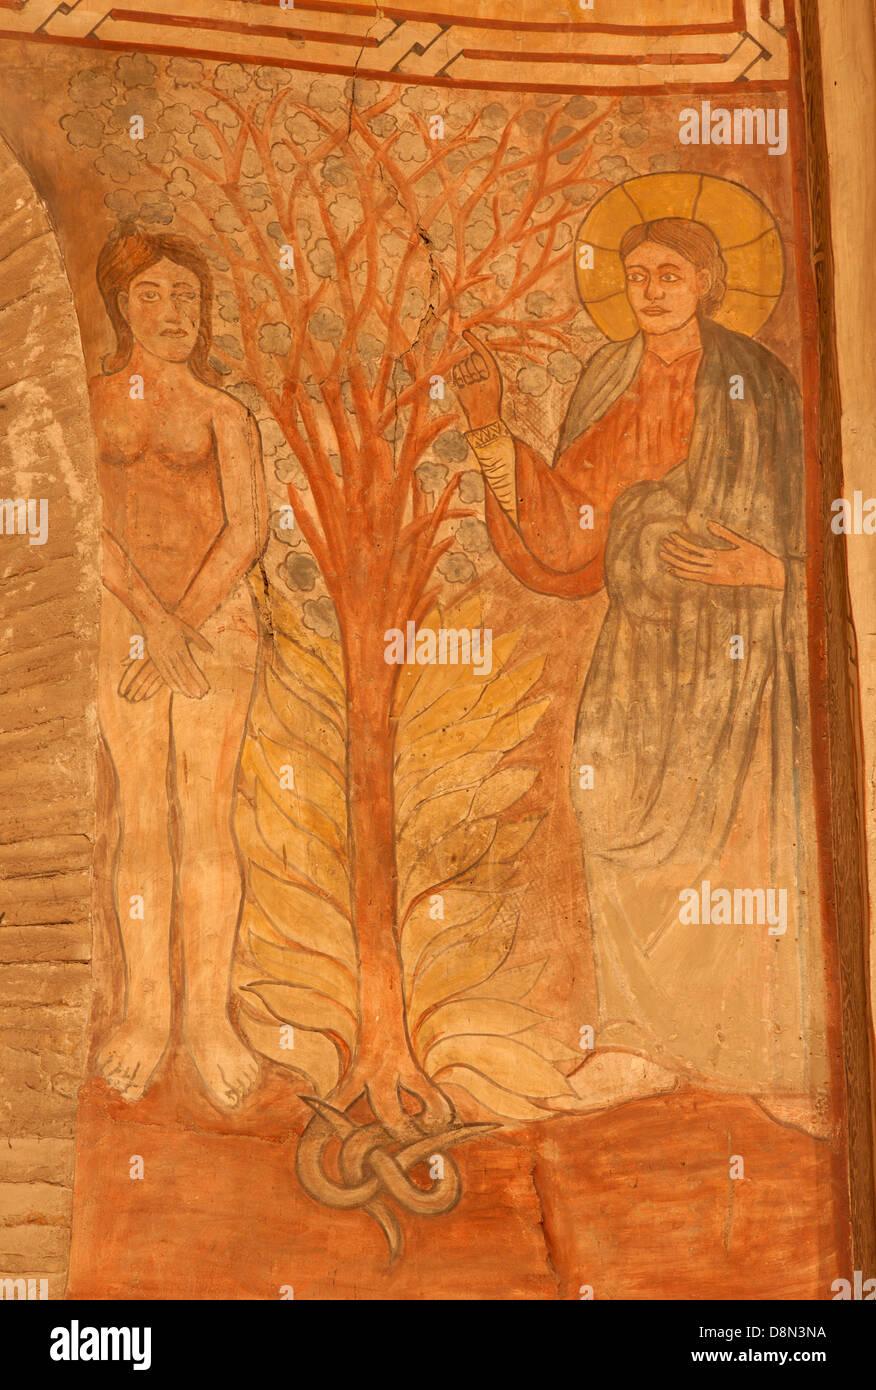 TOLEDO - MARCH 8: Creation of Eva fresco in church San Roman. - Stock Image